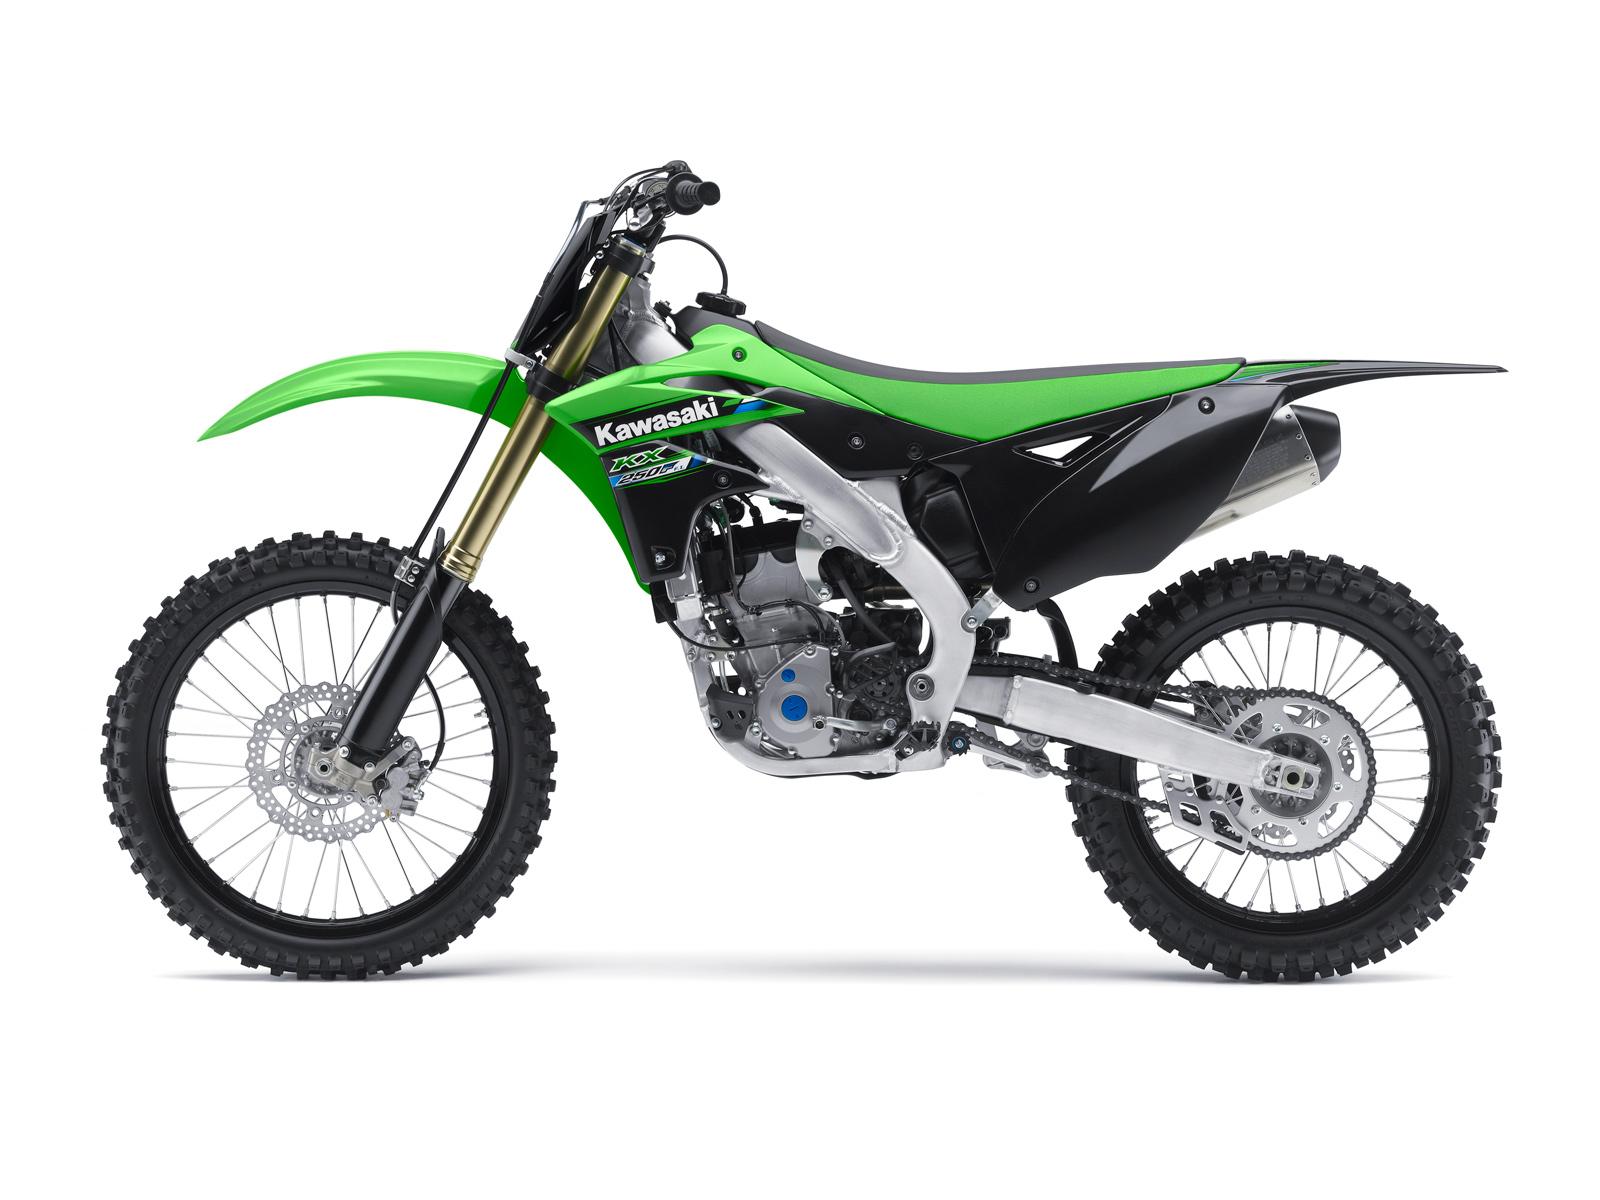 2013 Kawasaki Motocross Bikes First Look Dirt Rider